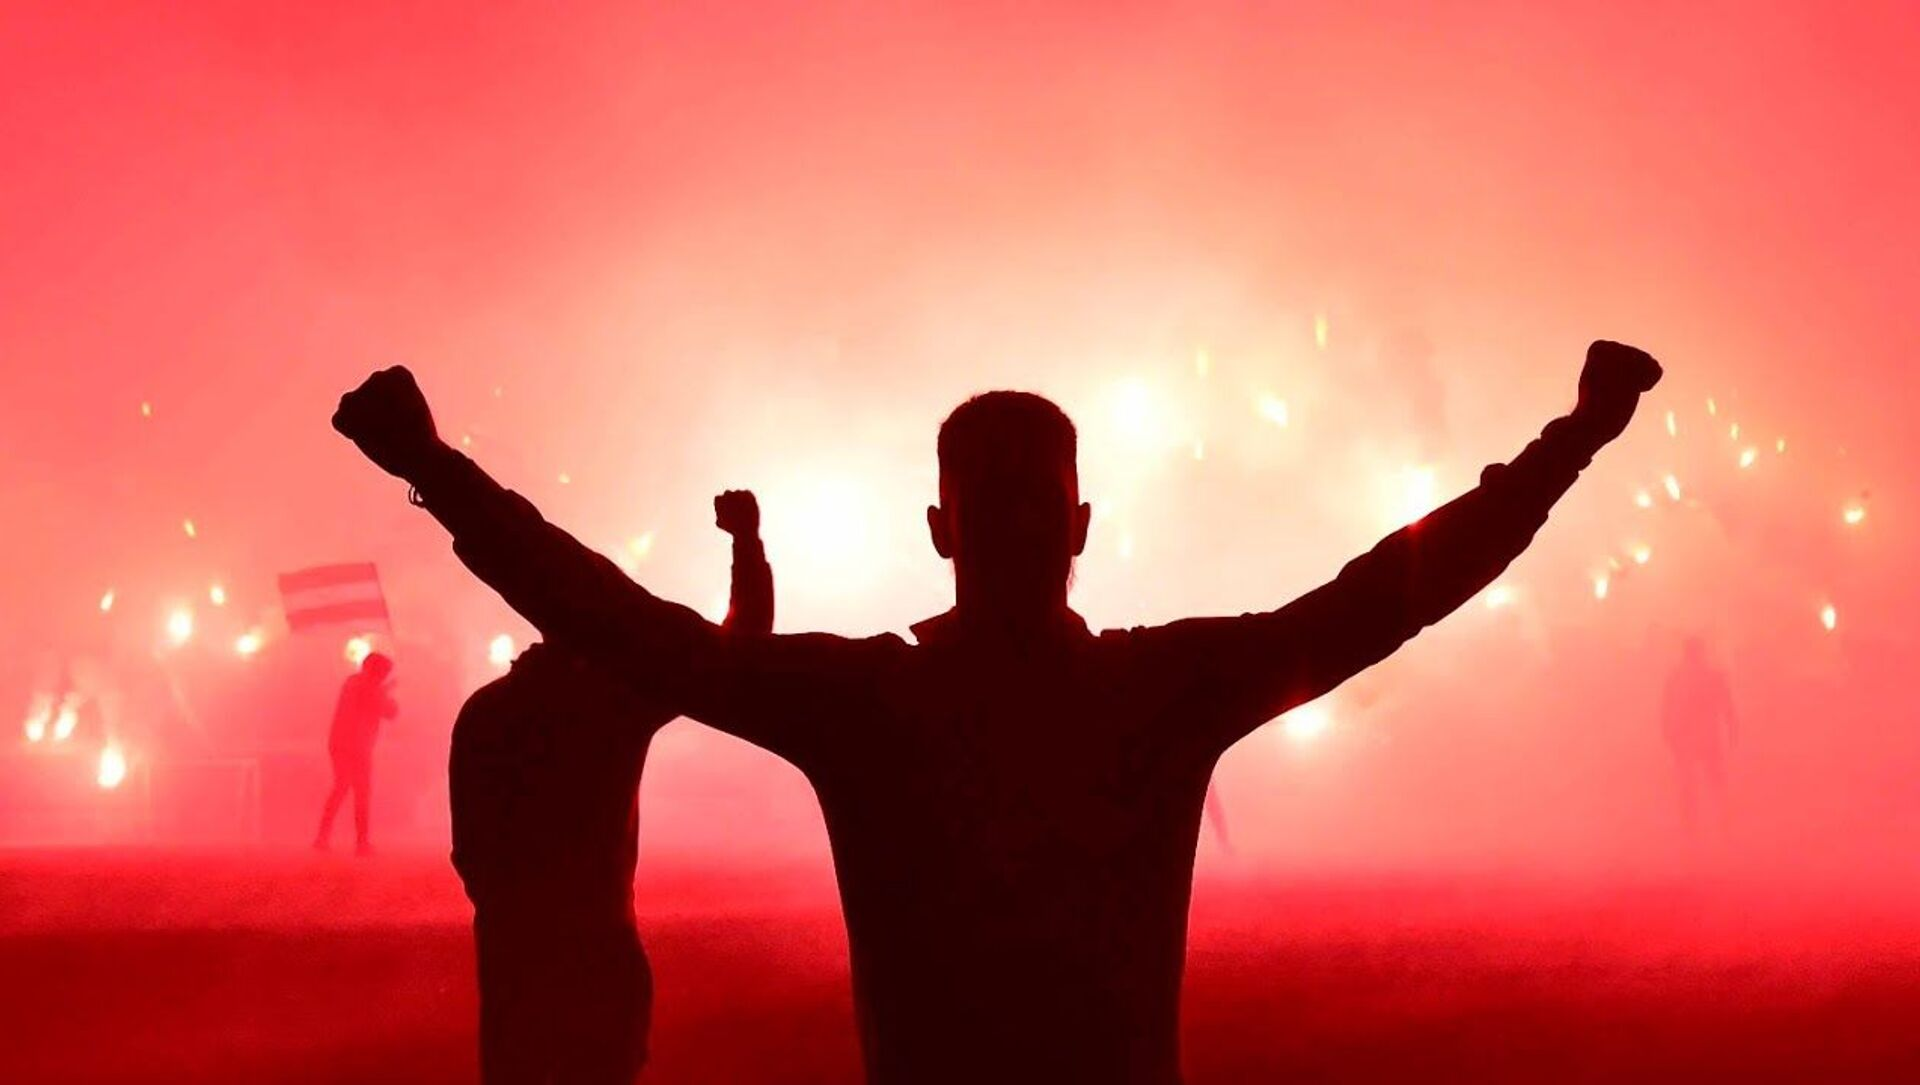 Spektakl navijača Crvene zvezde pred meč sa Milanom u nokaut fazi Lige Evrope - Sputnik Srbija, 1920, 08.04.2021